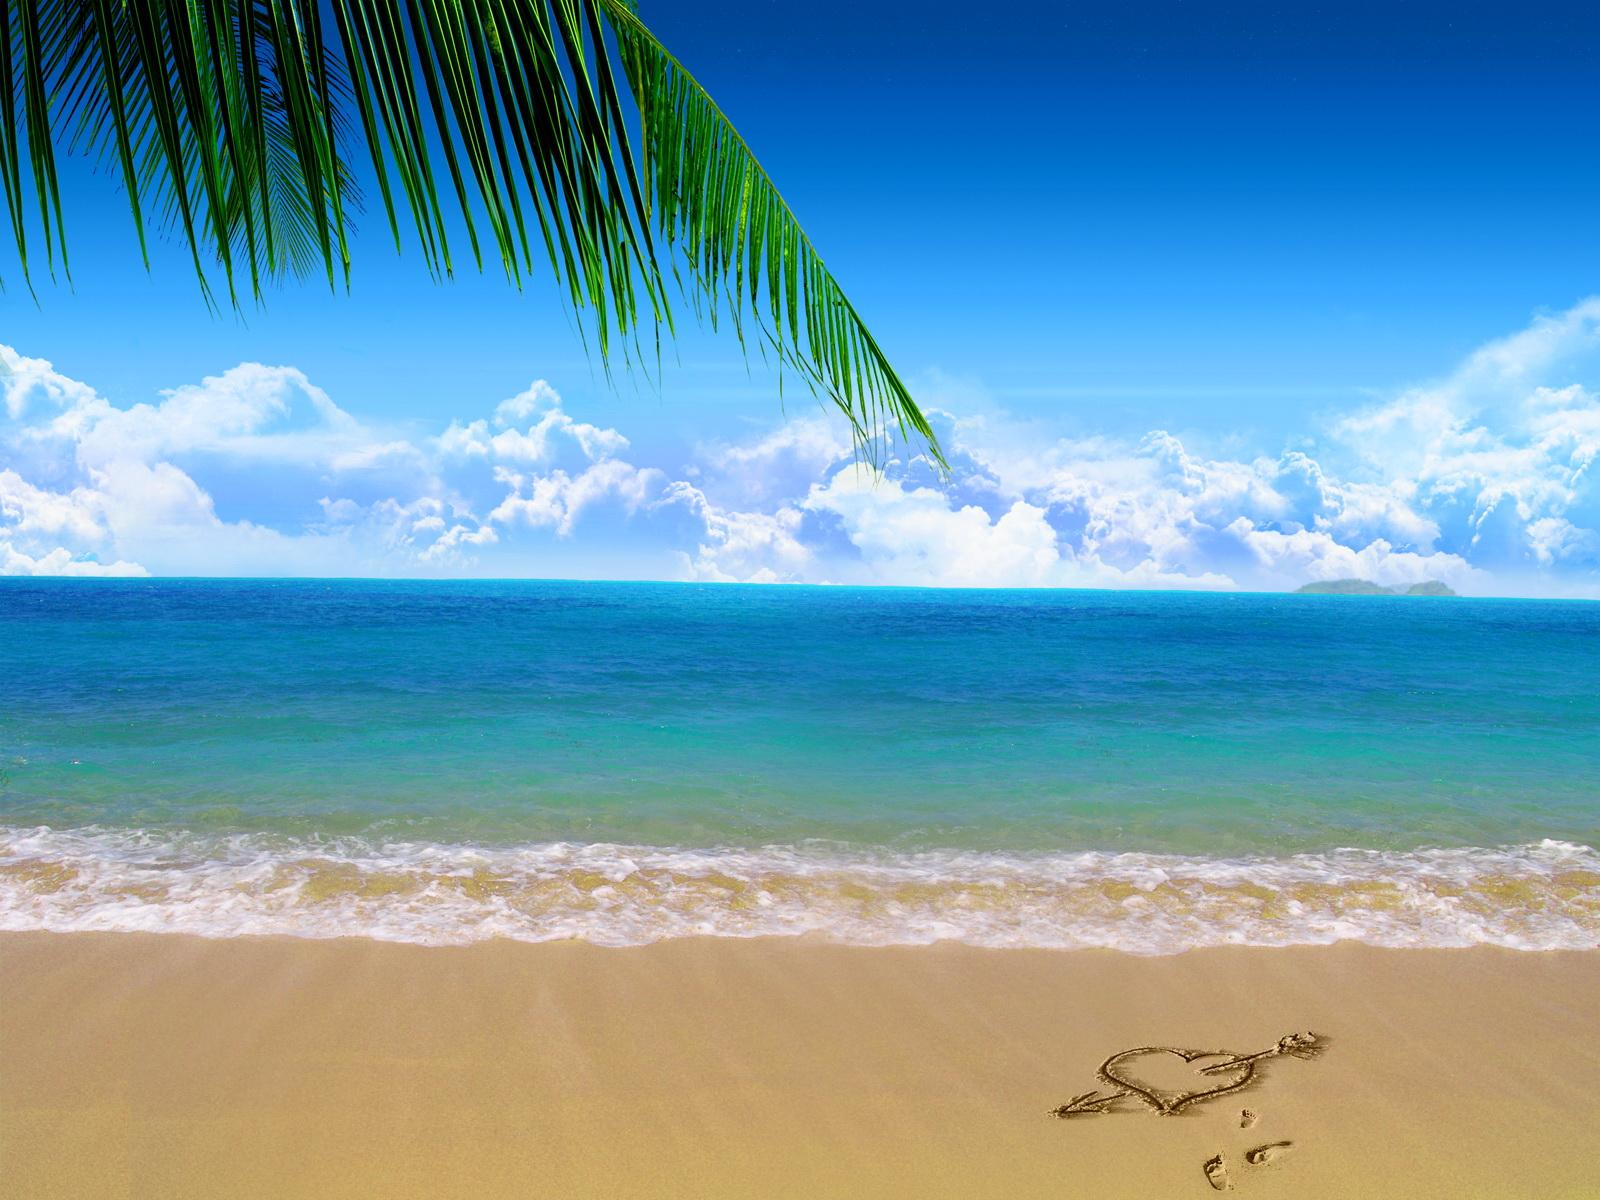 Fotos De Paisajes De Playas